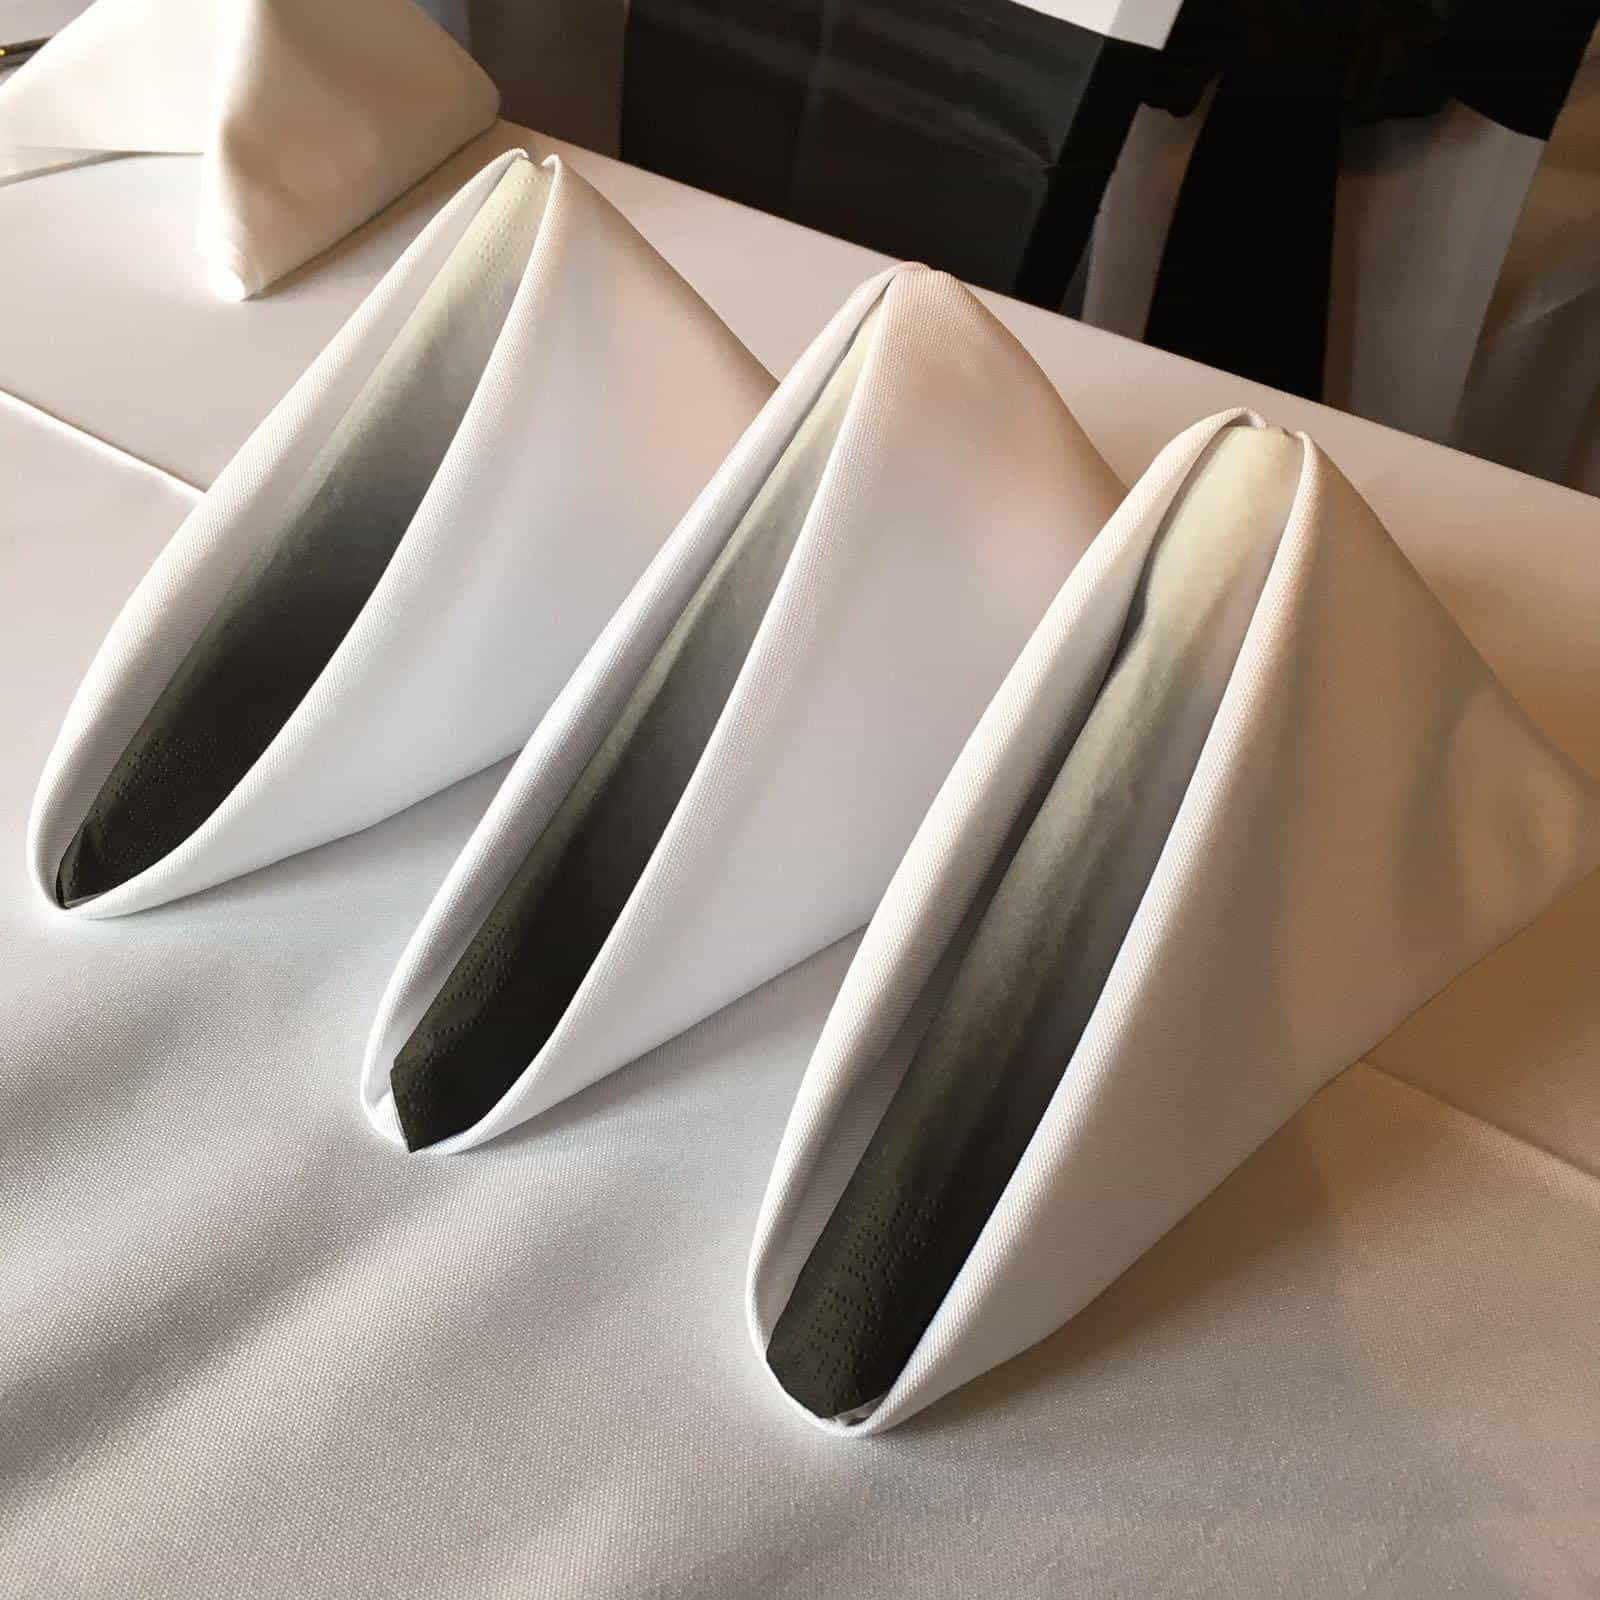 three dinner napkins folded nicely